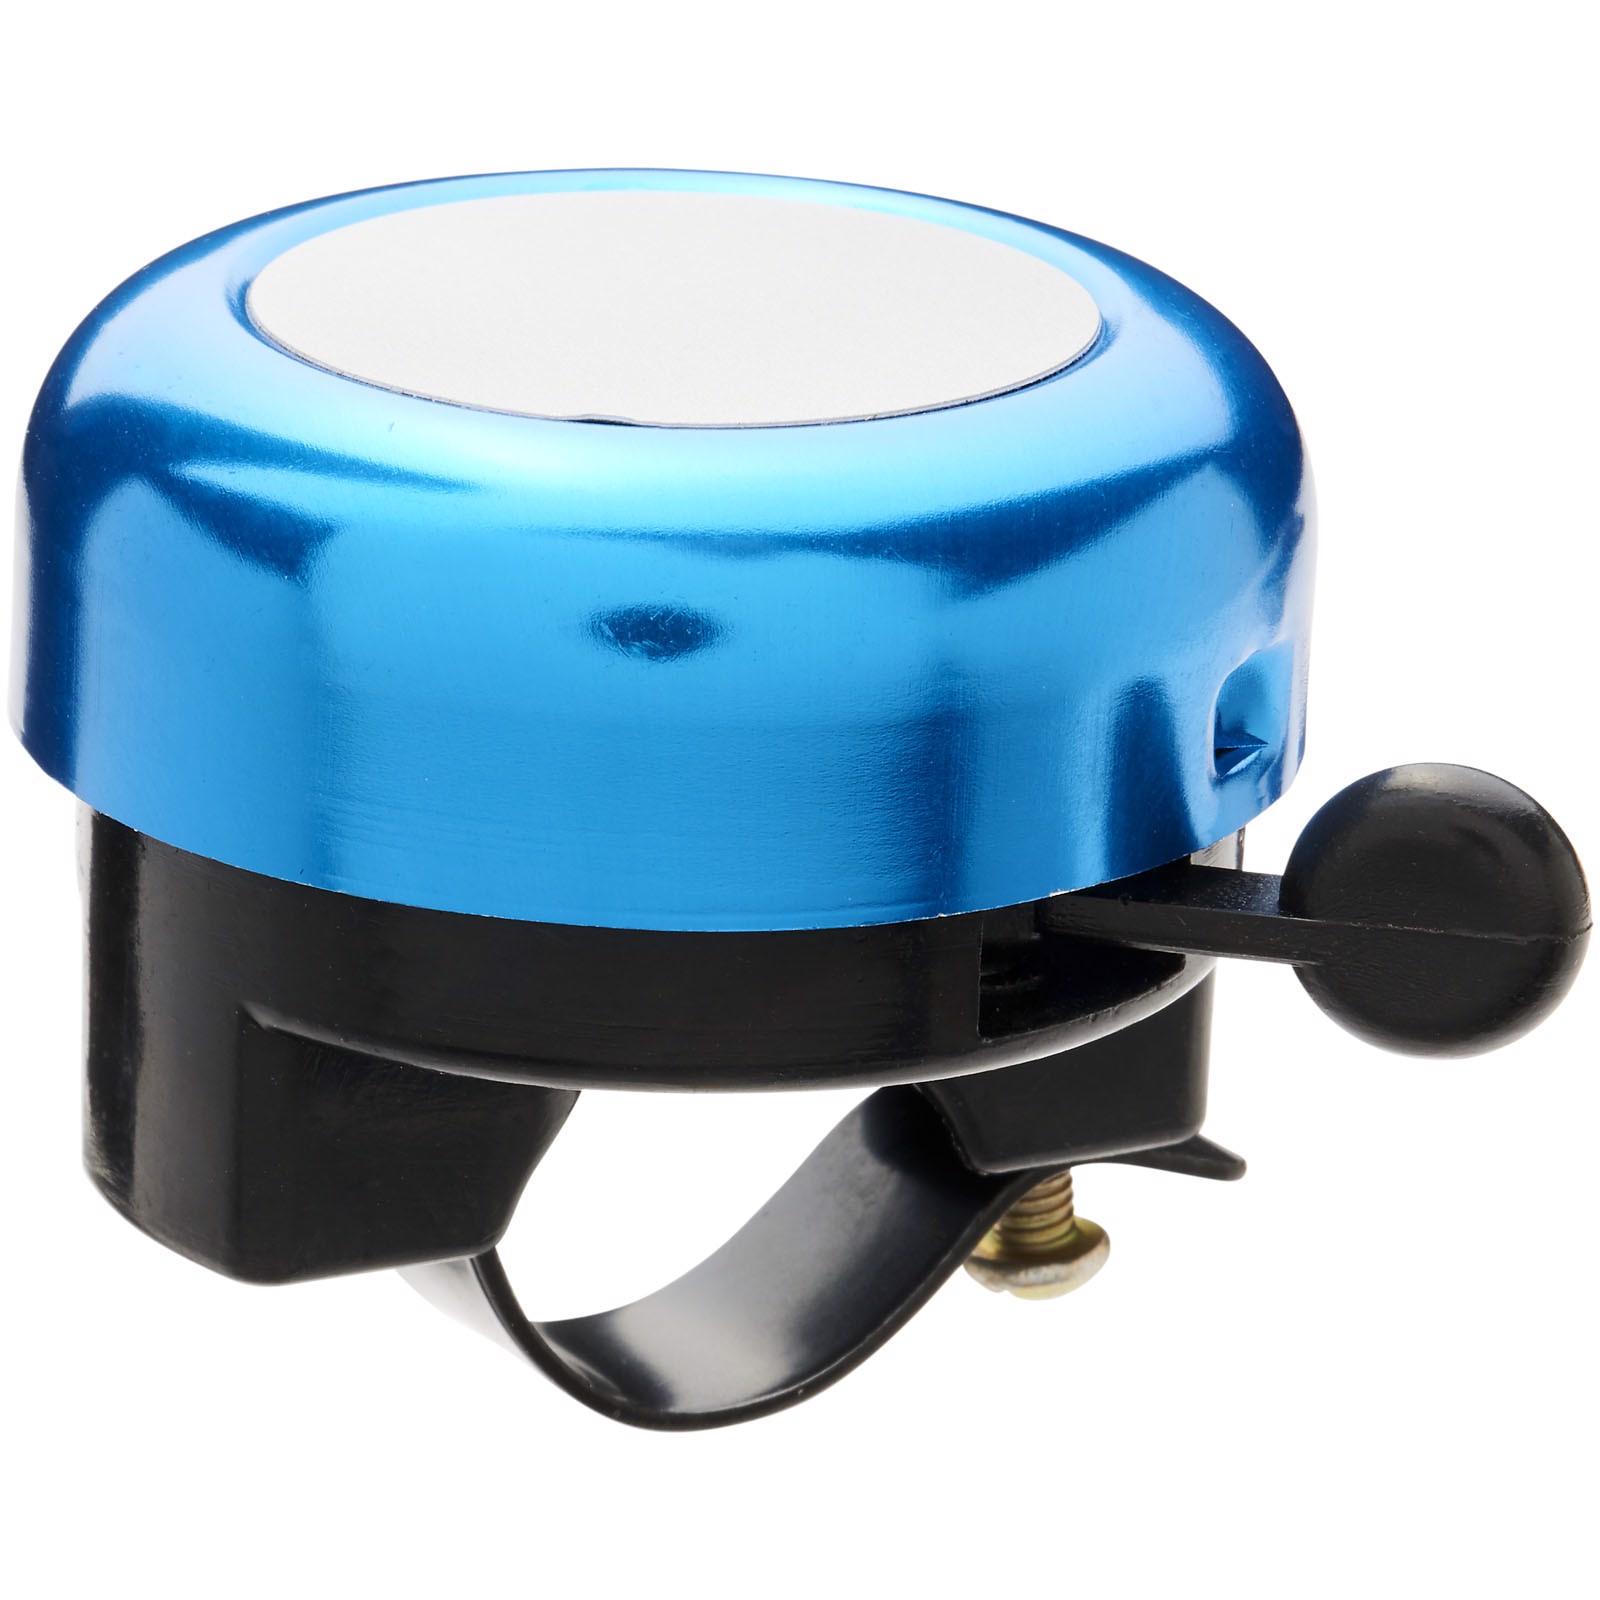 Hliníkový zvonek na kolo Tringtring - Process Blue